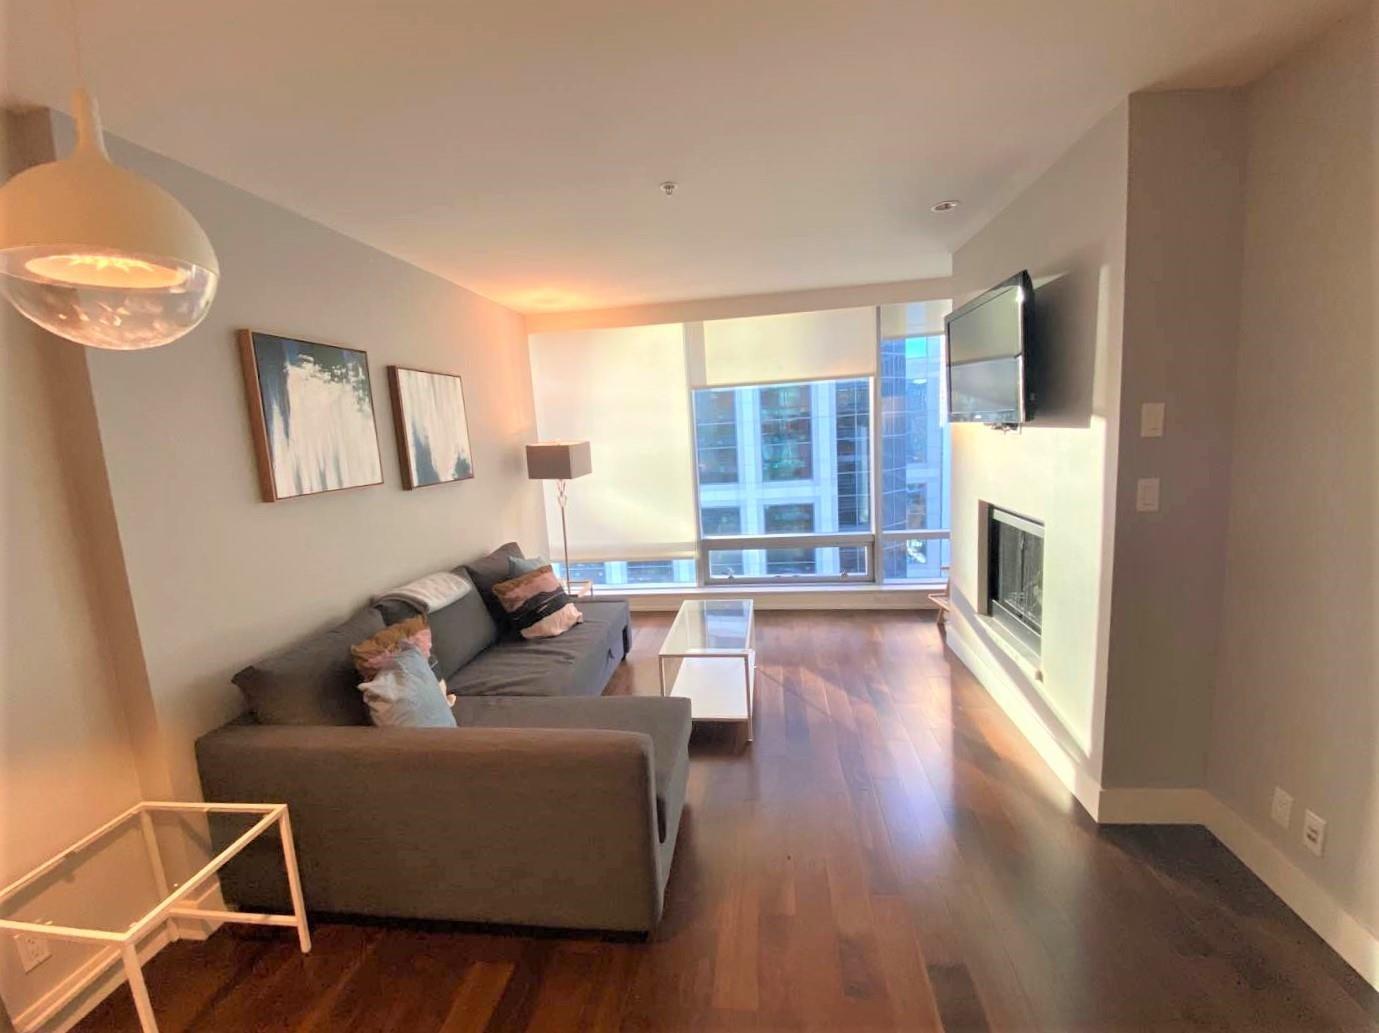 1704 1111 ALBERNI STREET - West End VW Apartment/Condo for sale, 1 Bedroom (R2624971)